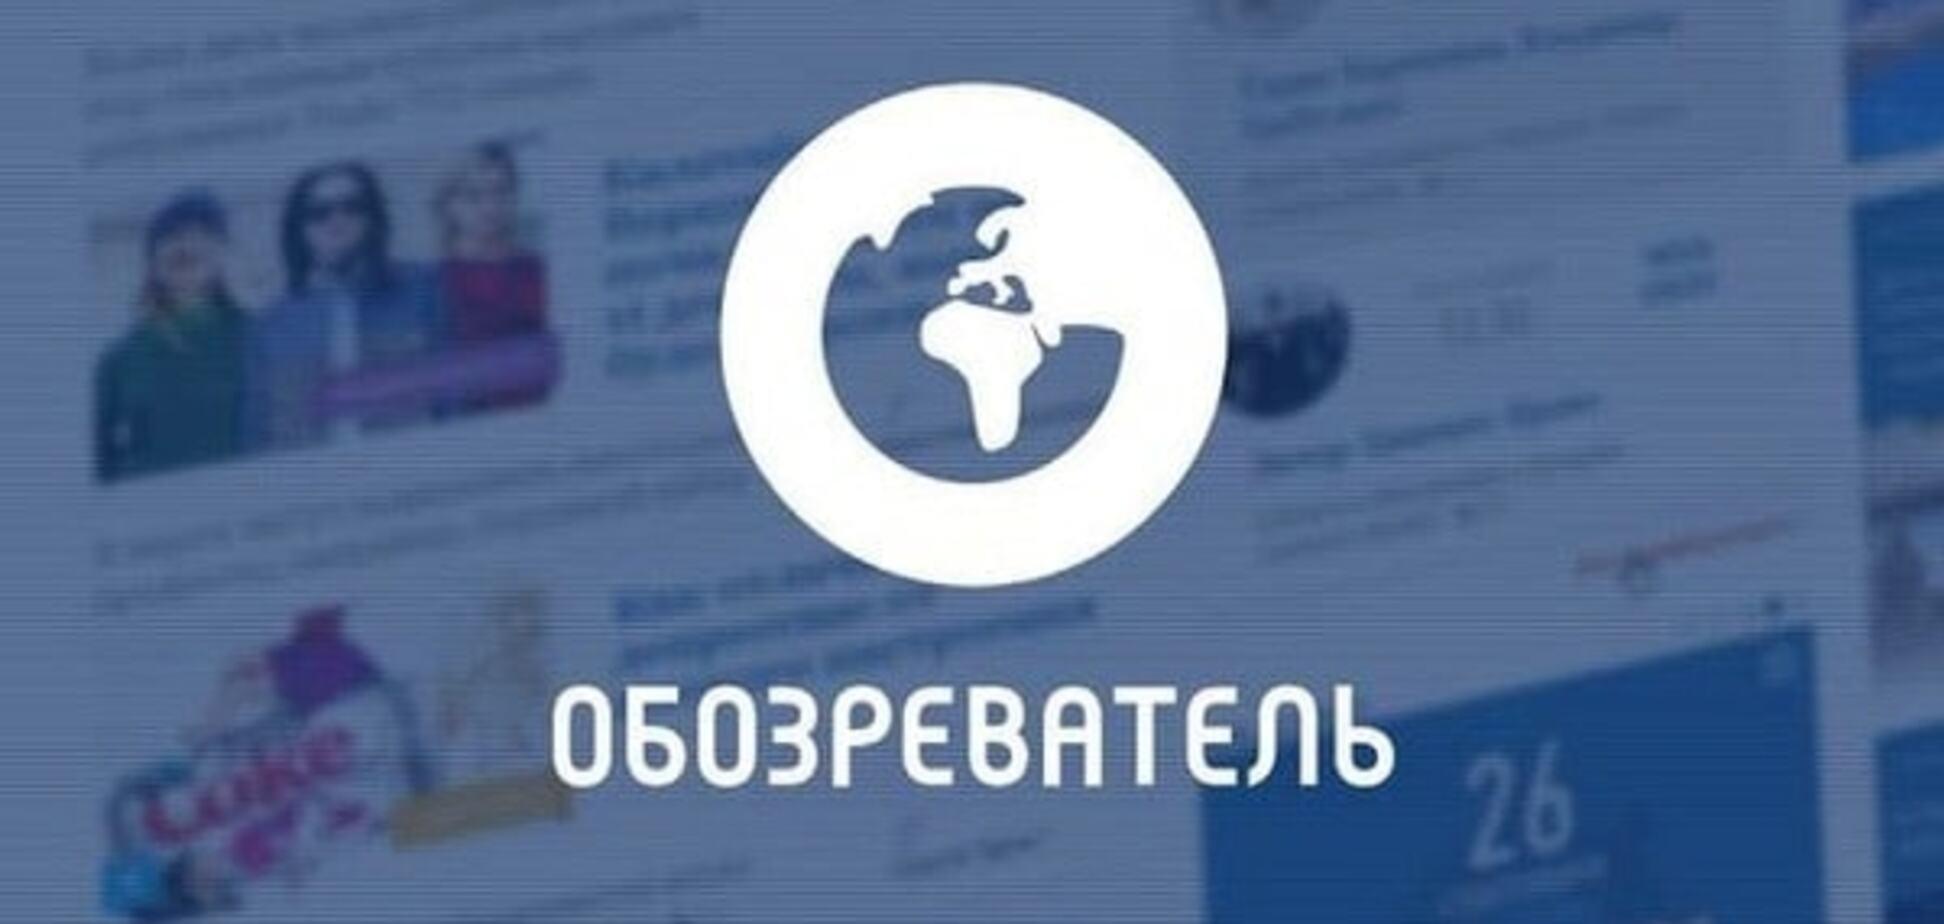 митинг, Россия, протест